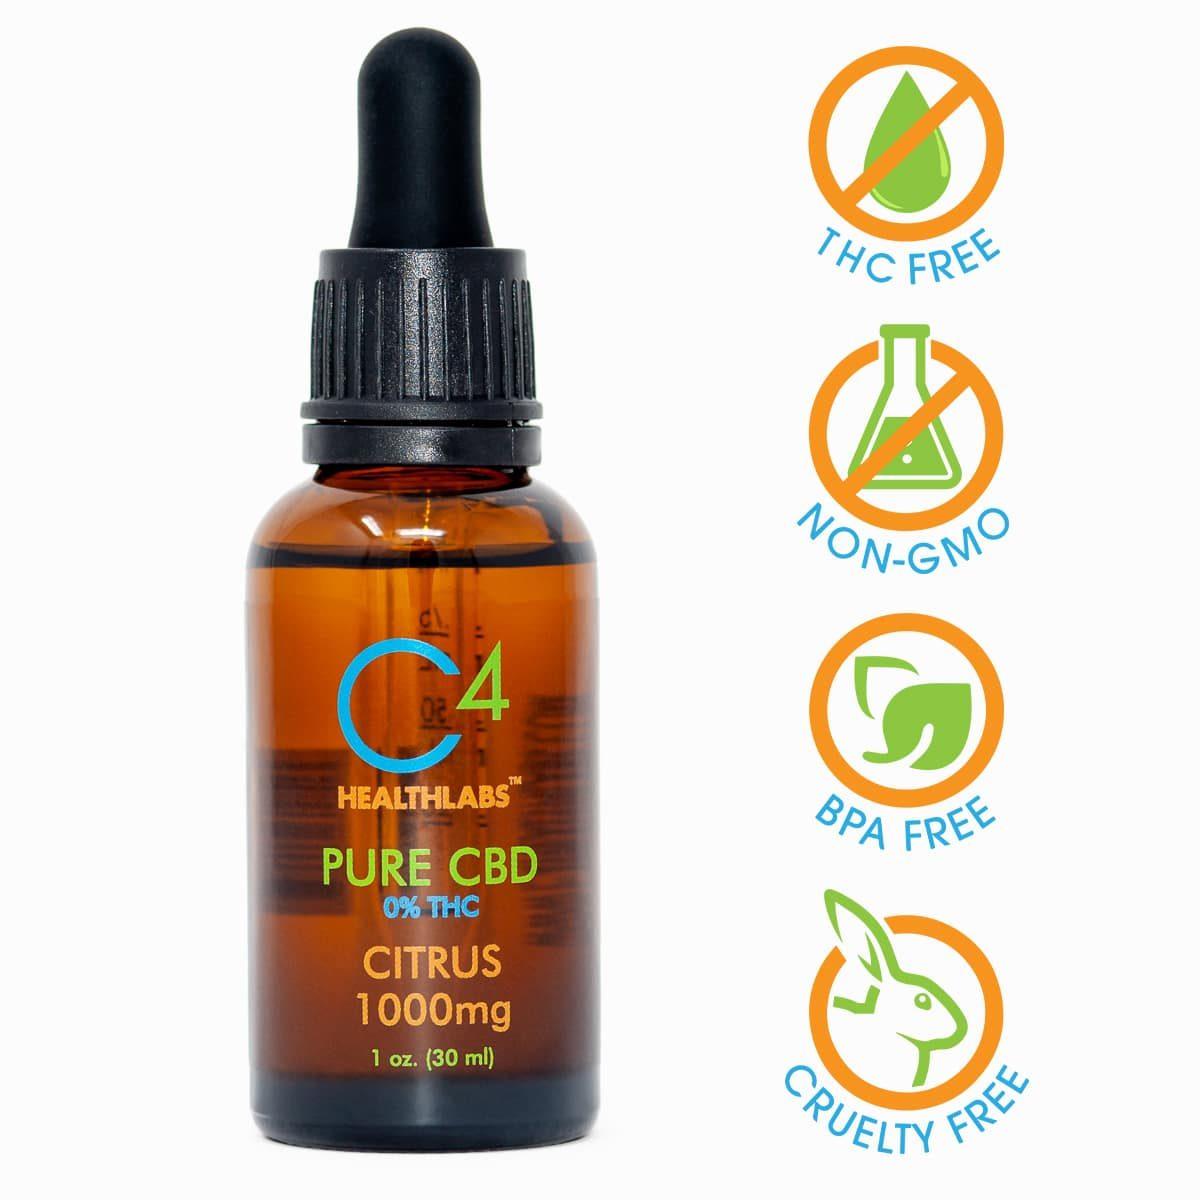 C4 Healthlabs Citrus 1000 MG THC Free CBD Oil